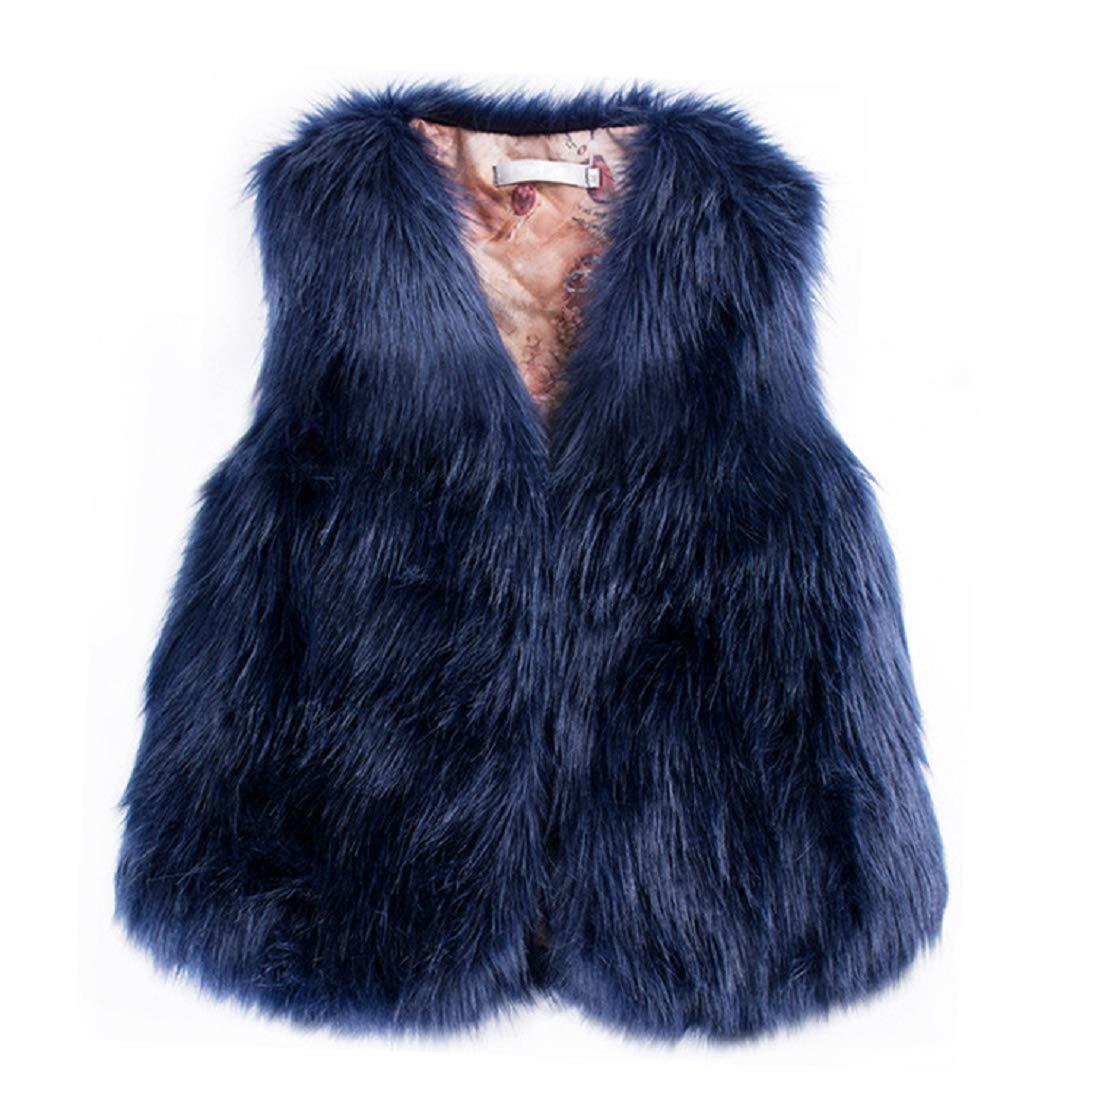 Womens Waistcoat Sleeveless Faux Fur Vest Coat Solid Color Winter Loose Outwear (2XL, Navy)